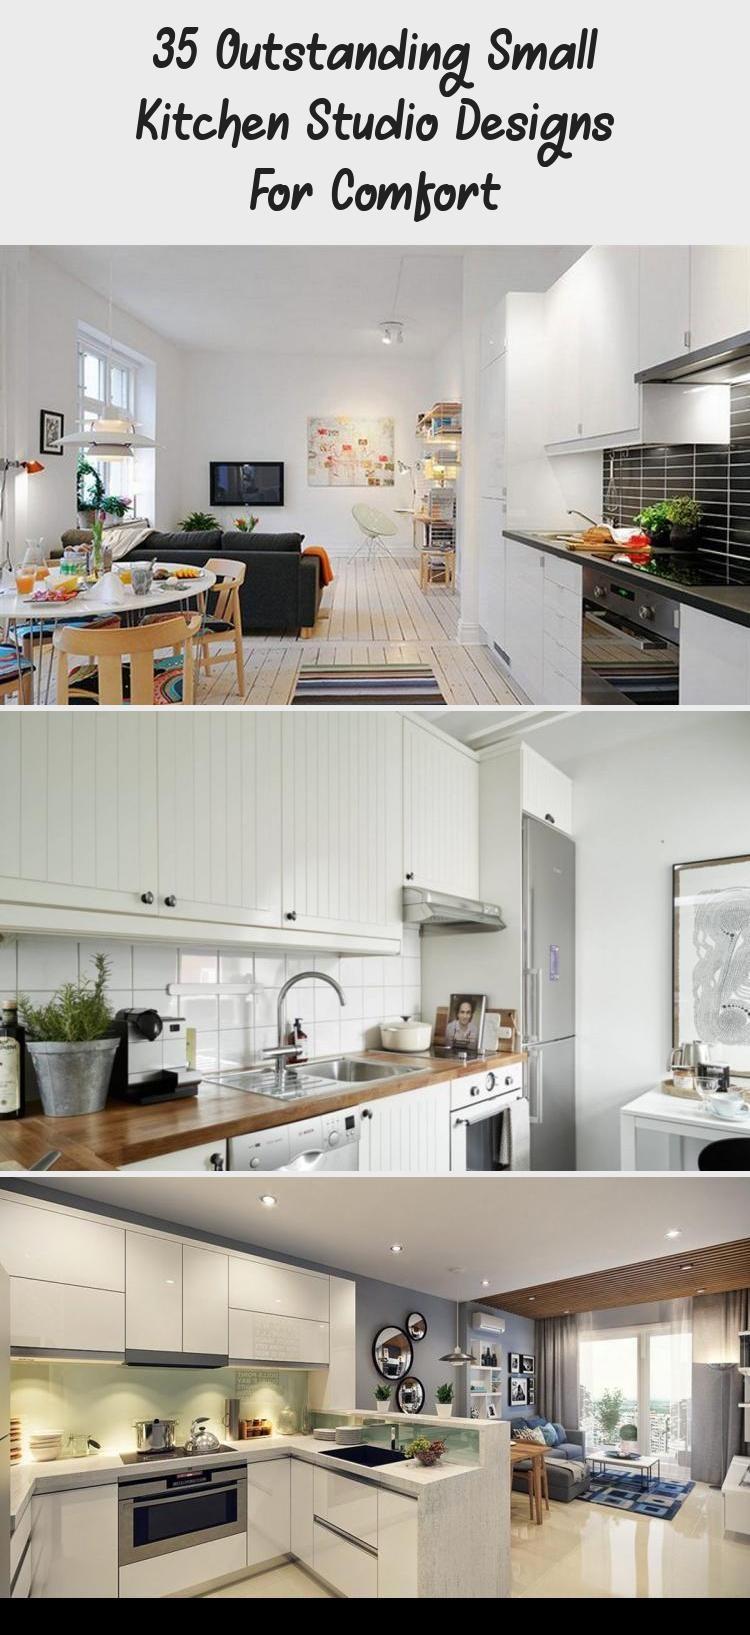 35 outstanding small kitchen studio designs for comfort